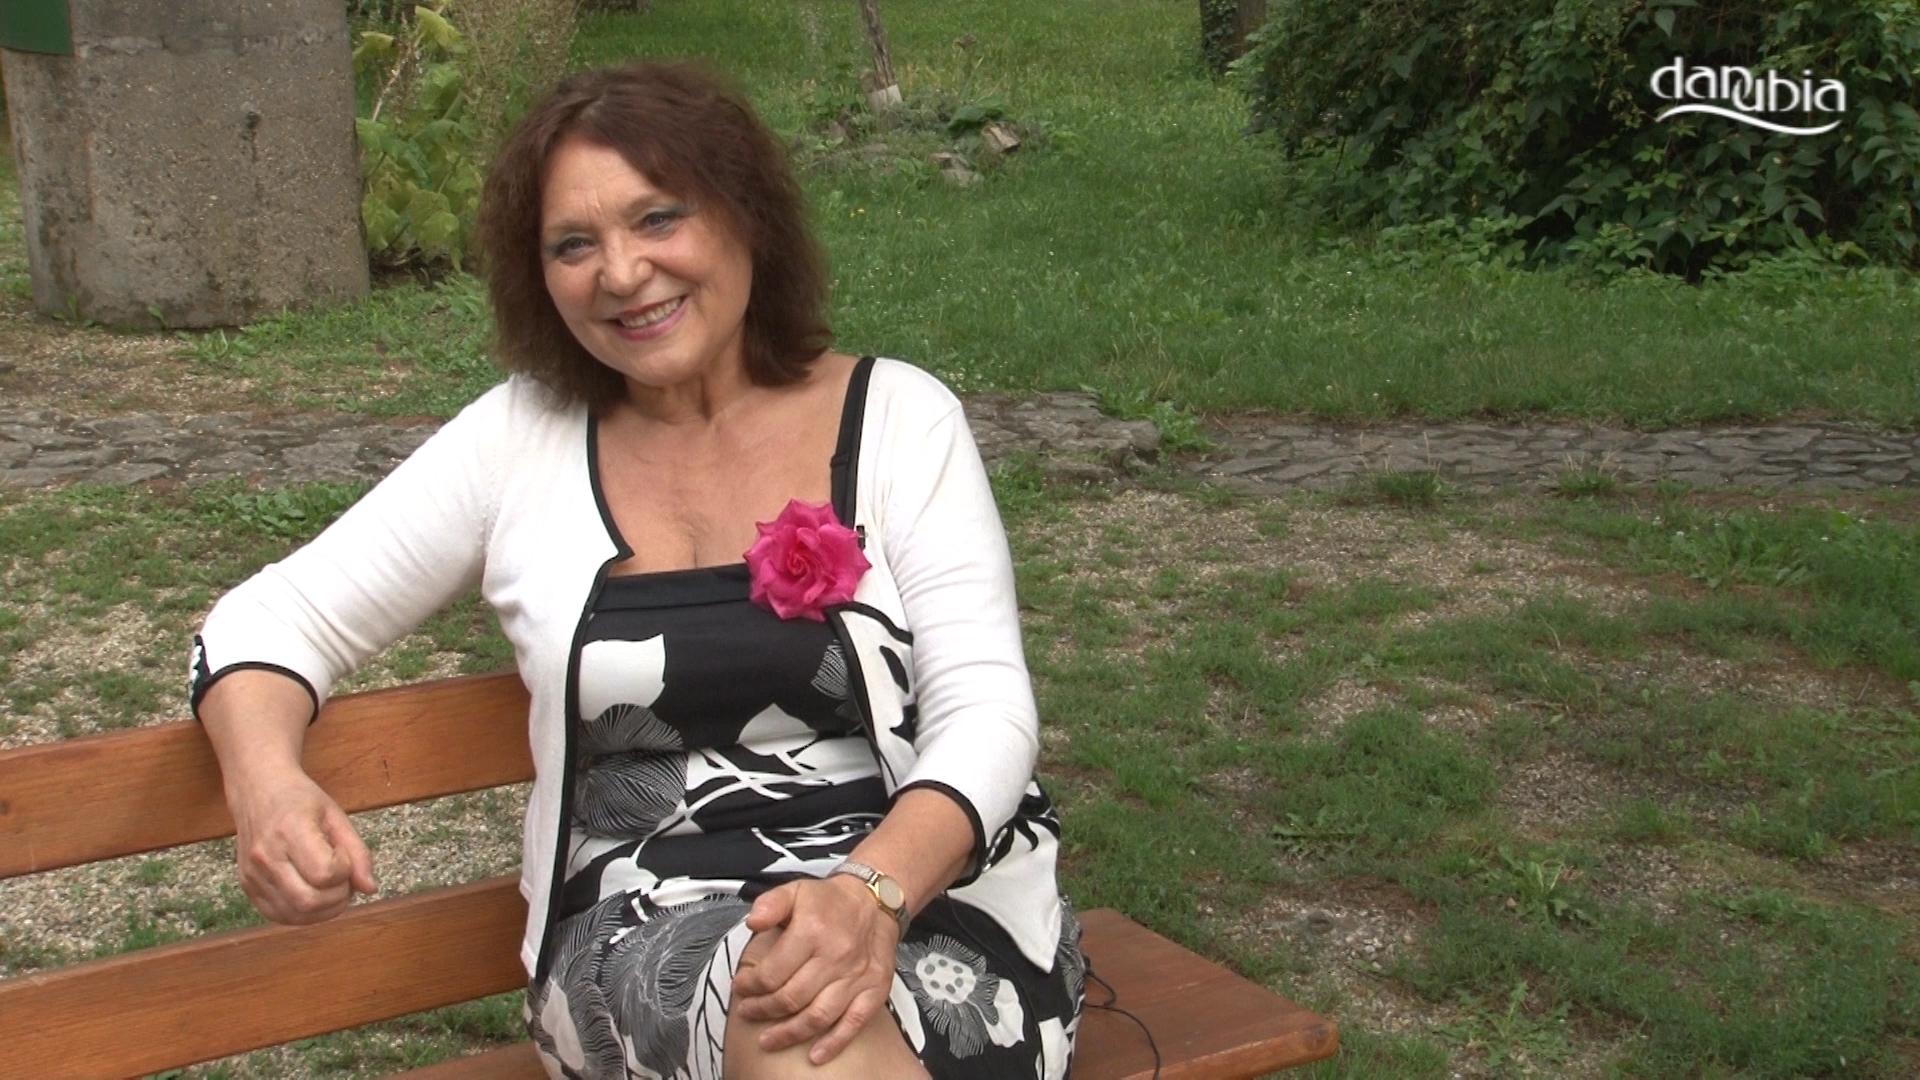 Death of an international Hungarian soprano, 64